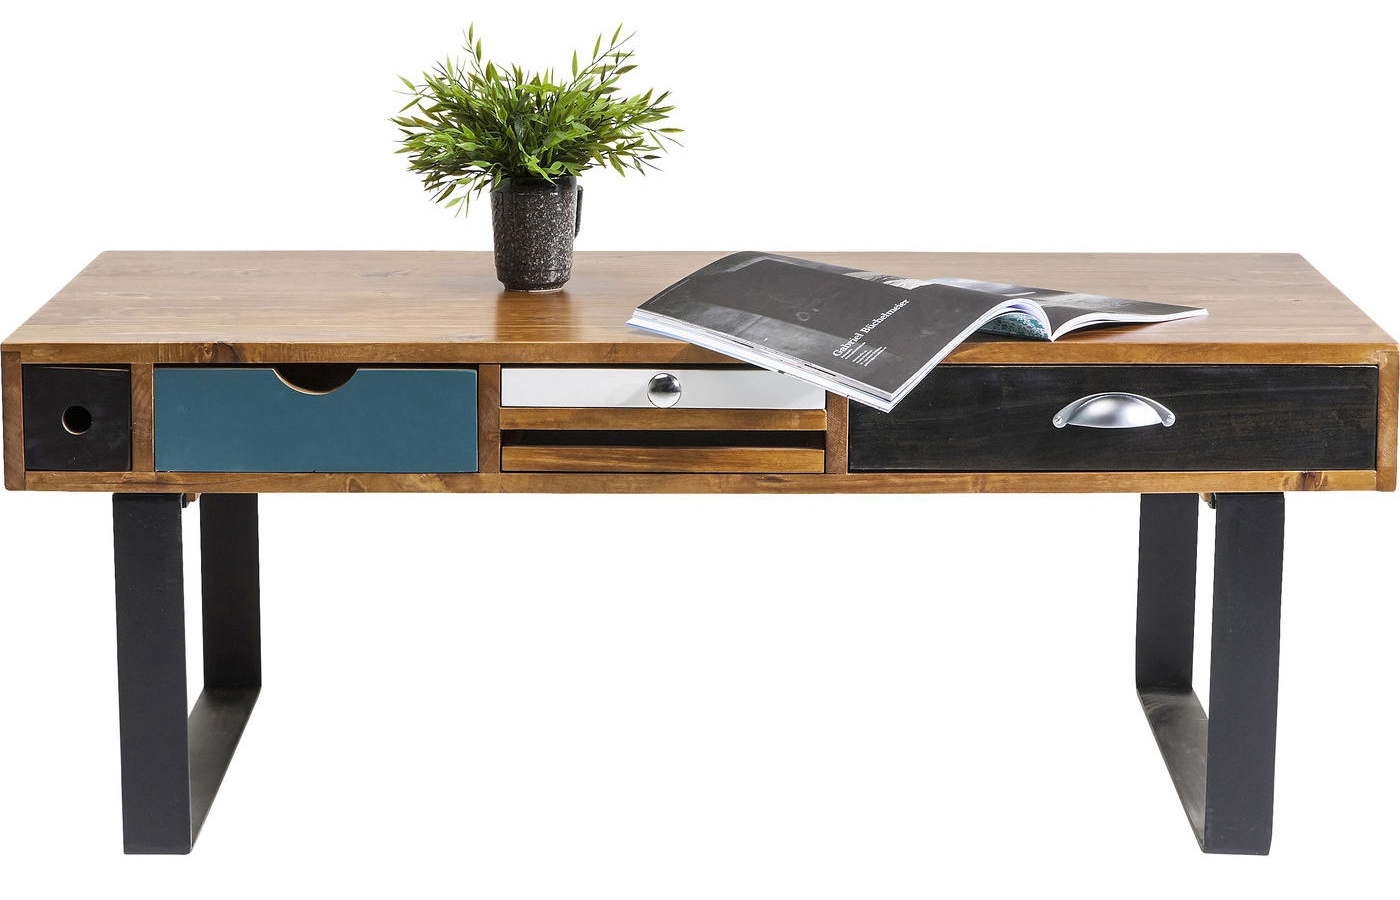 Kare Design Salontafel Babalou L120 X B60 X H45 Cm Populierenhout kopen